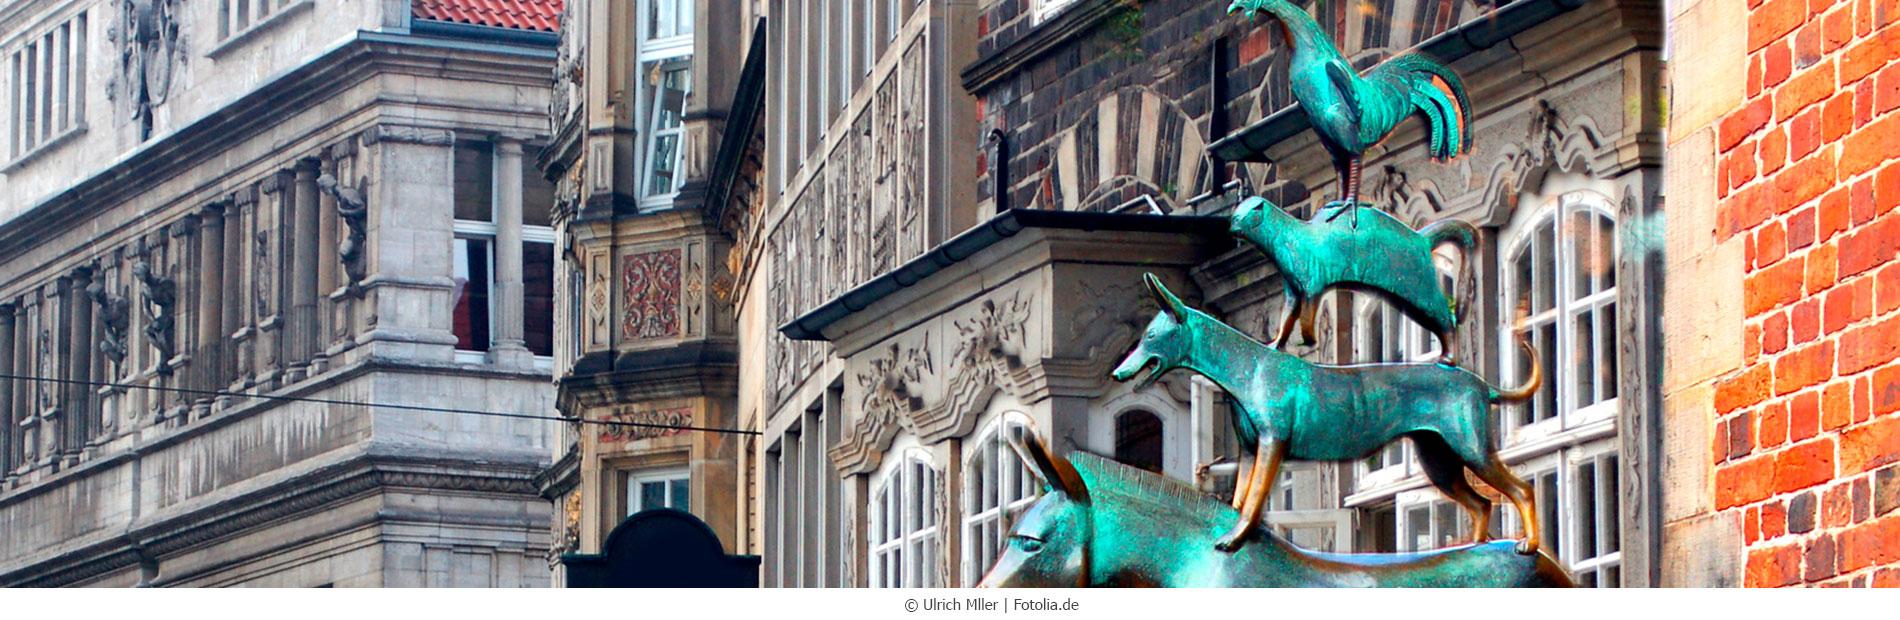 Bremen-Stadtmusikanten_Fotolia_16000416_M_webC